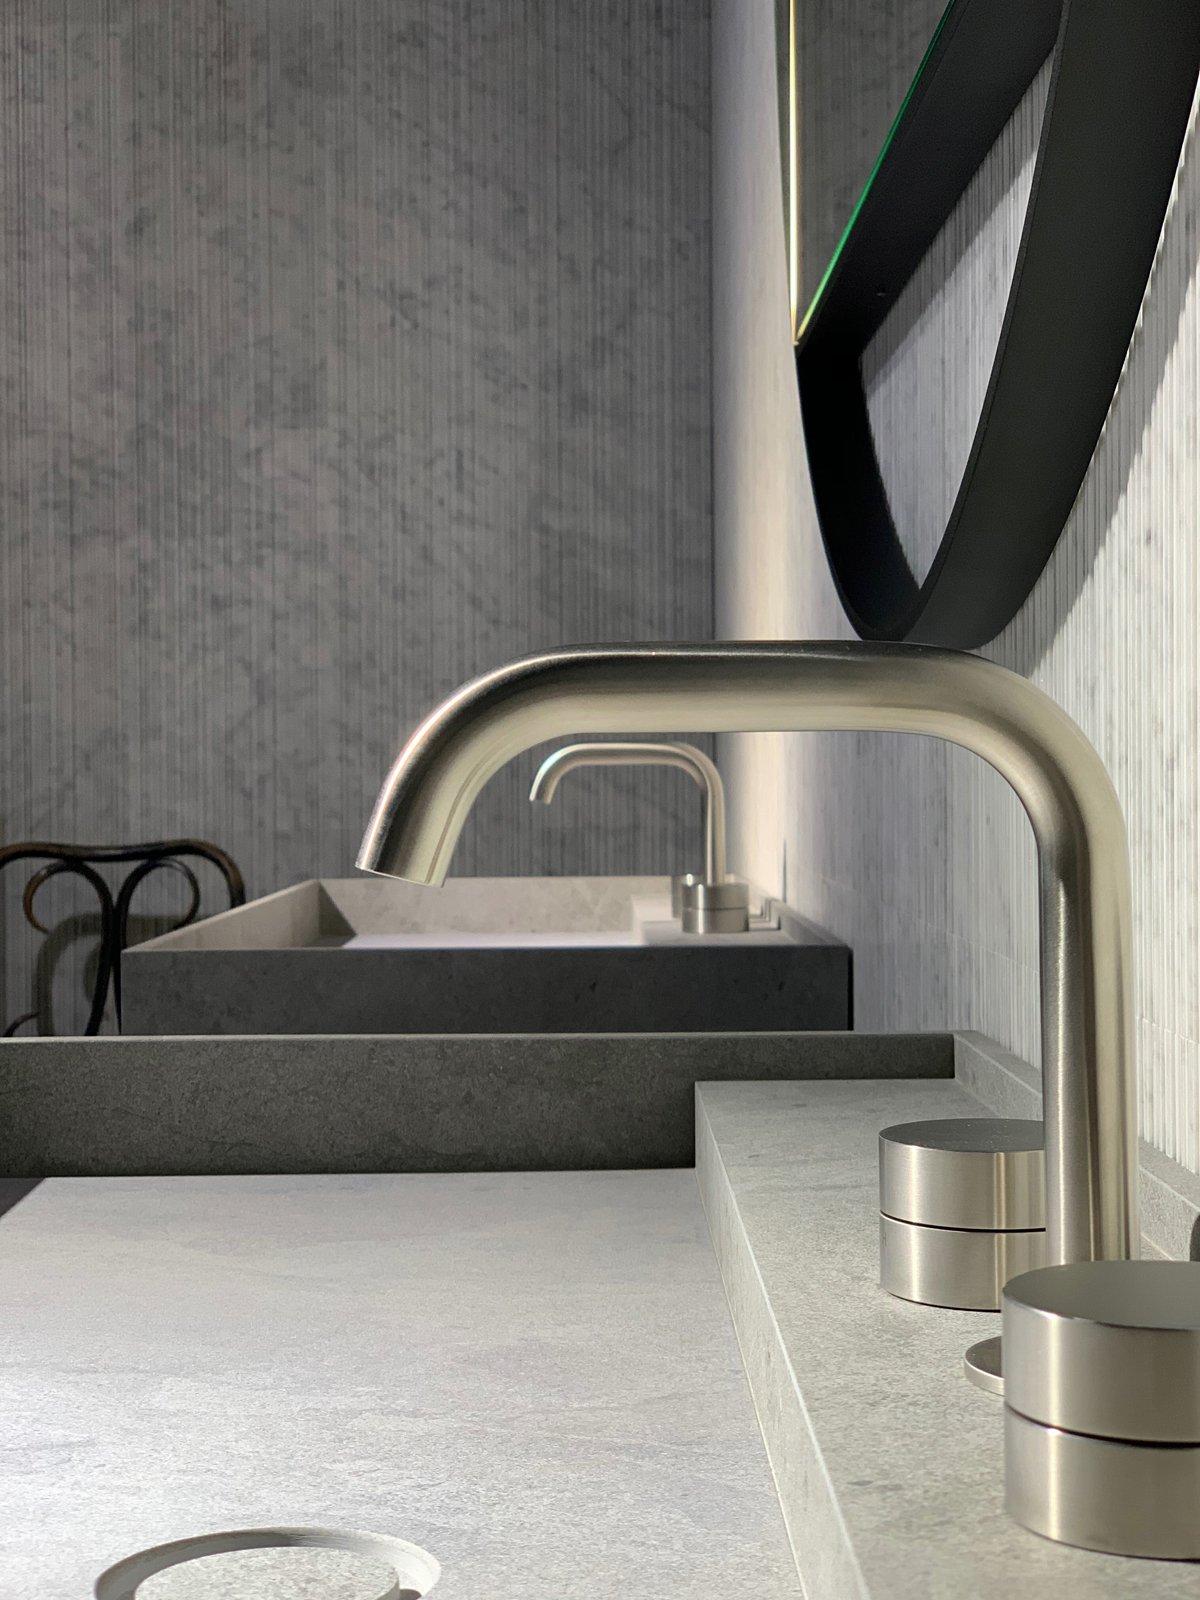 Boffi, Eclipse Tap set for washbasin